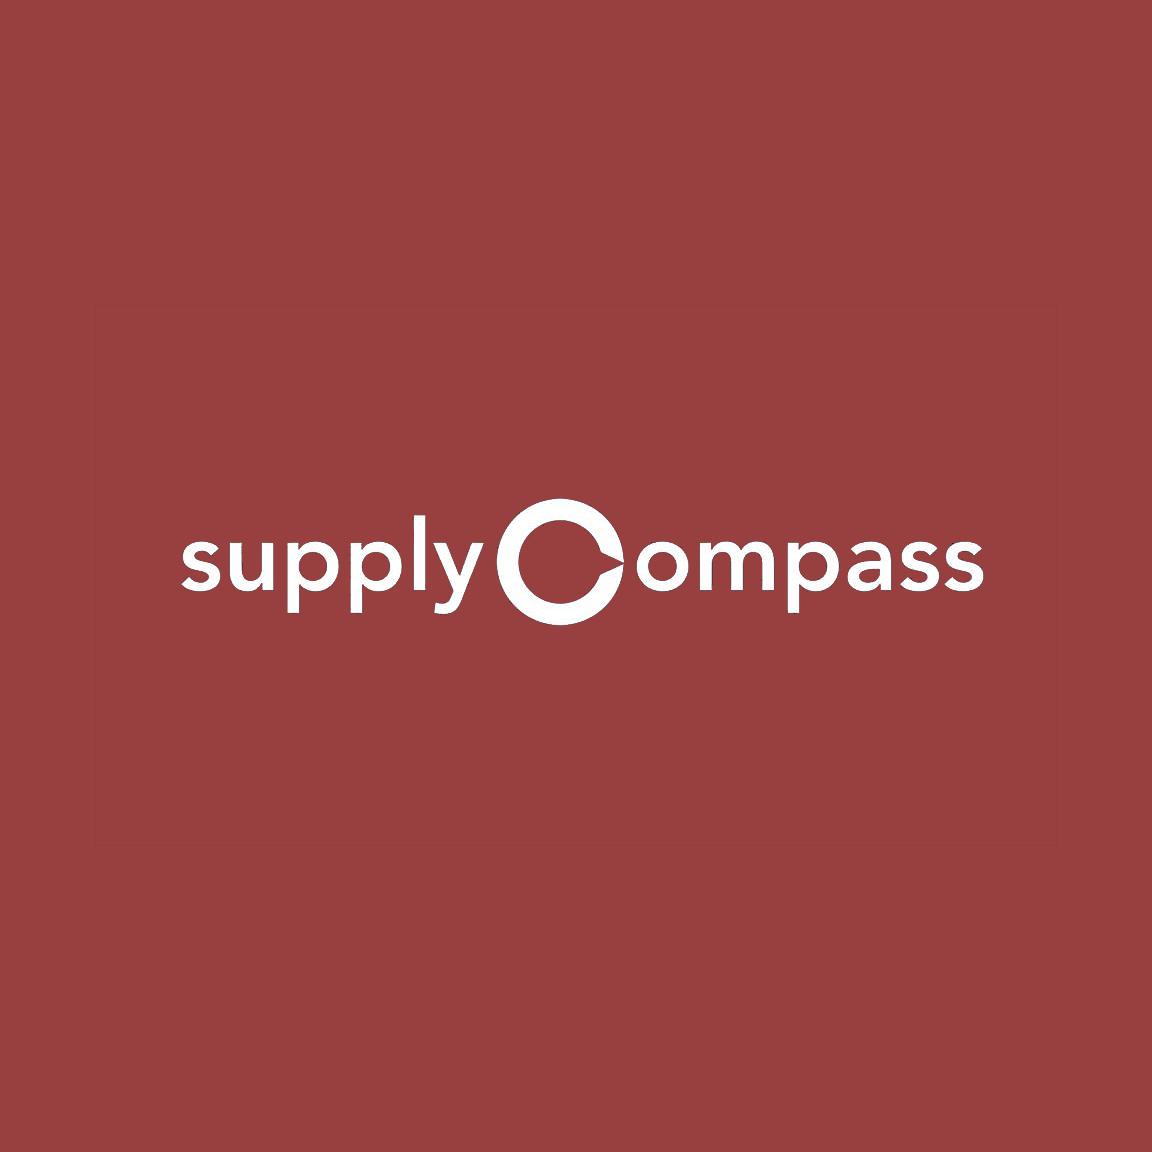 Supply Compass Logo